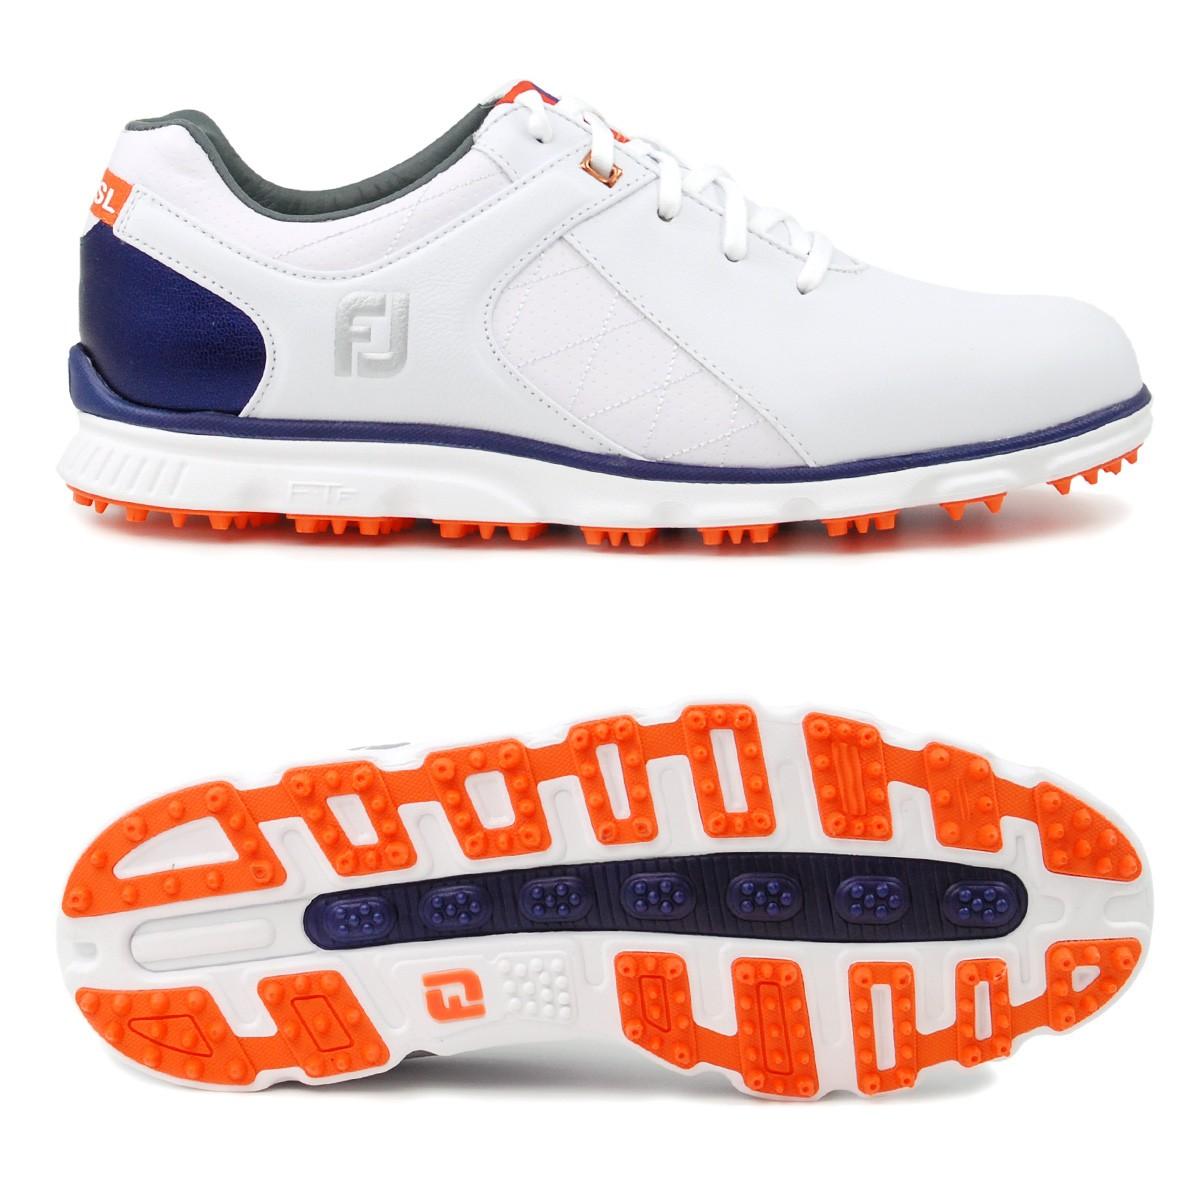 Golflaedchen.de FootJoy Pro SL Herren Golfschuhe, Weiß / Blau